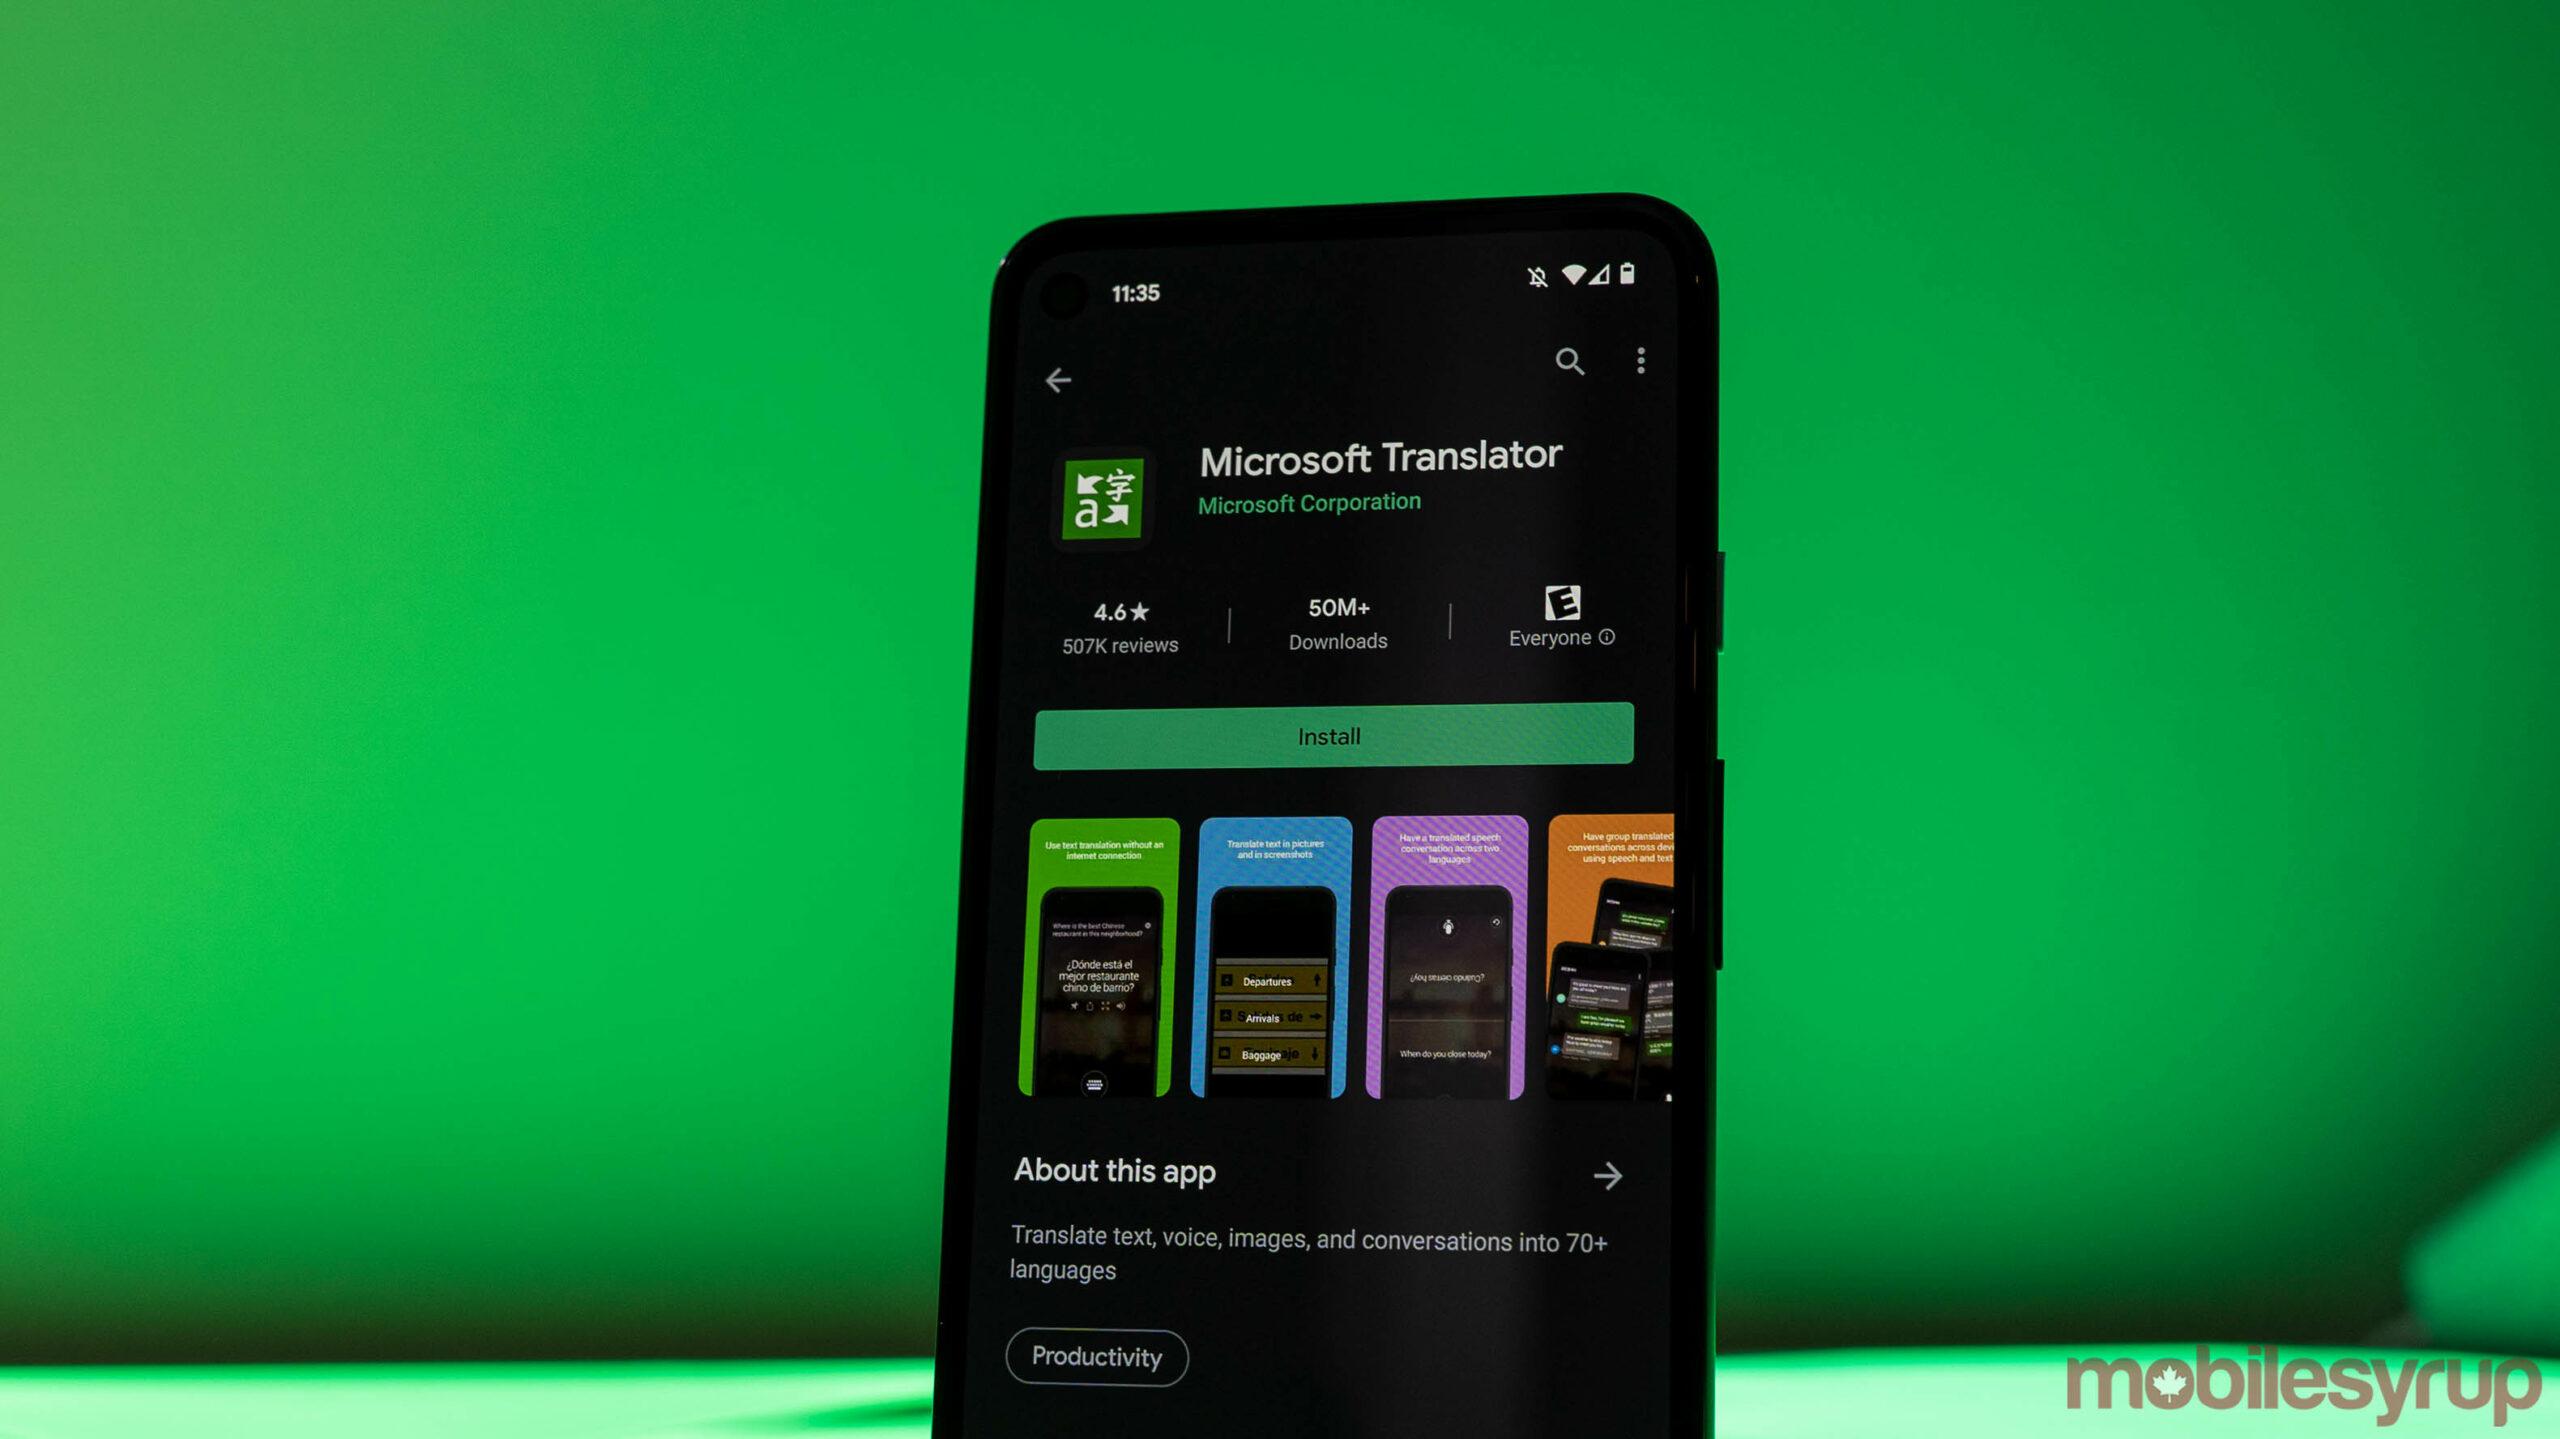 Microsoft Translator on Android